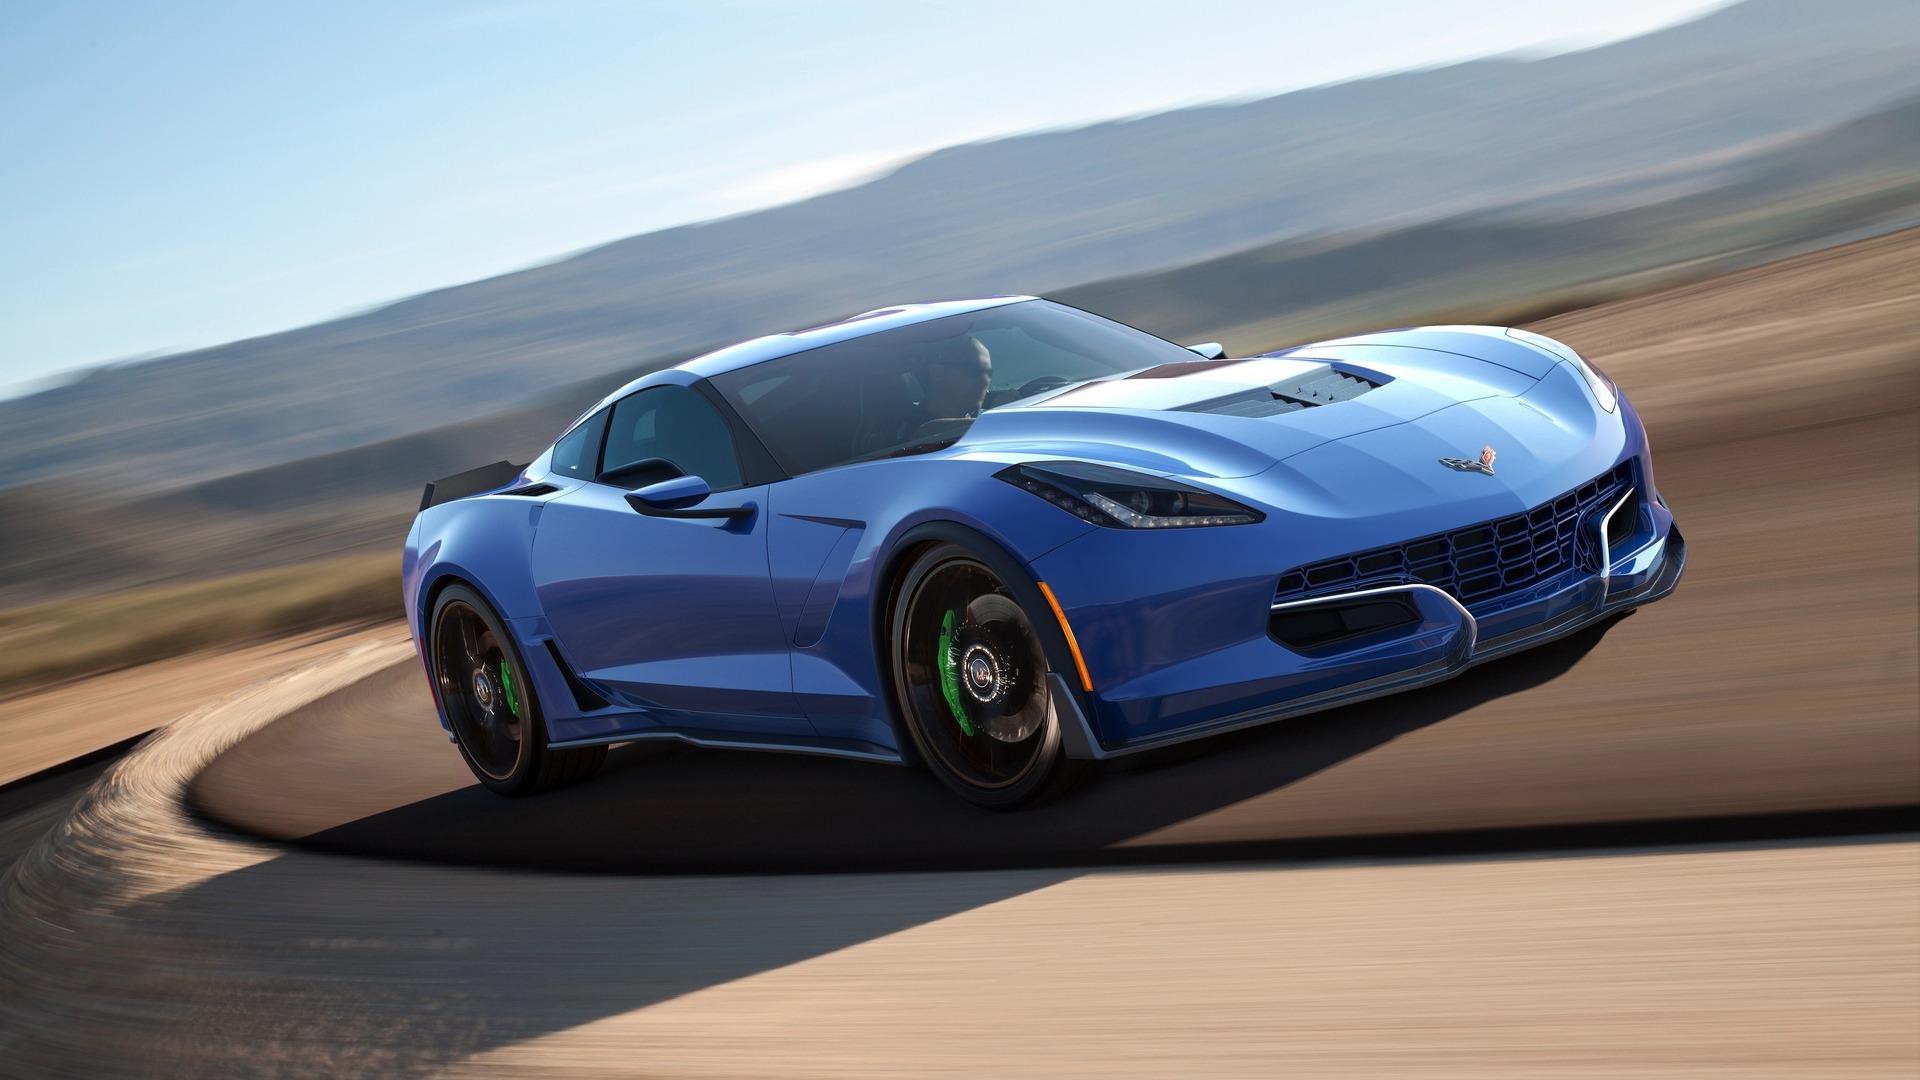 Genovation Corvette EV entering production with $750k price